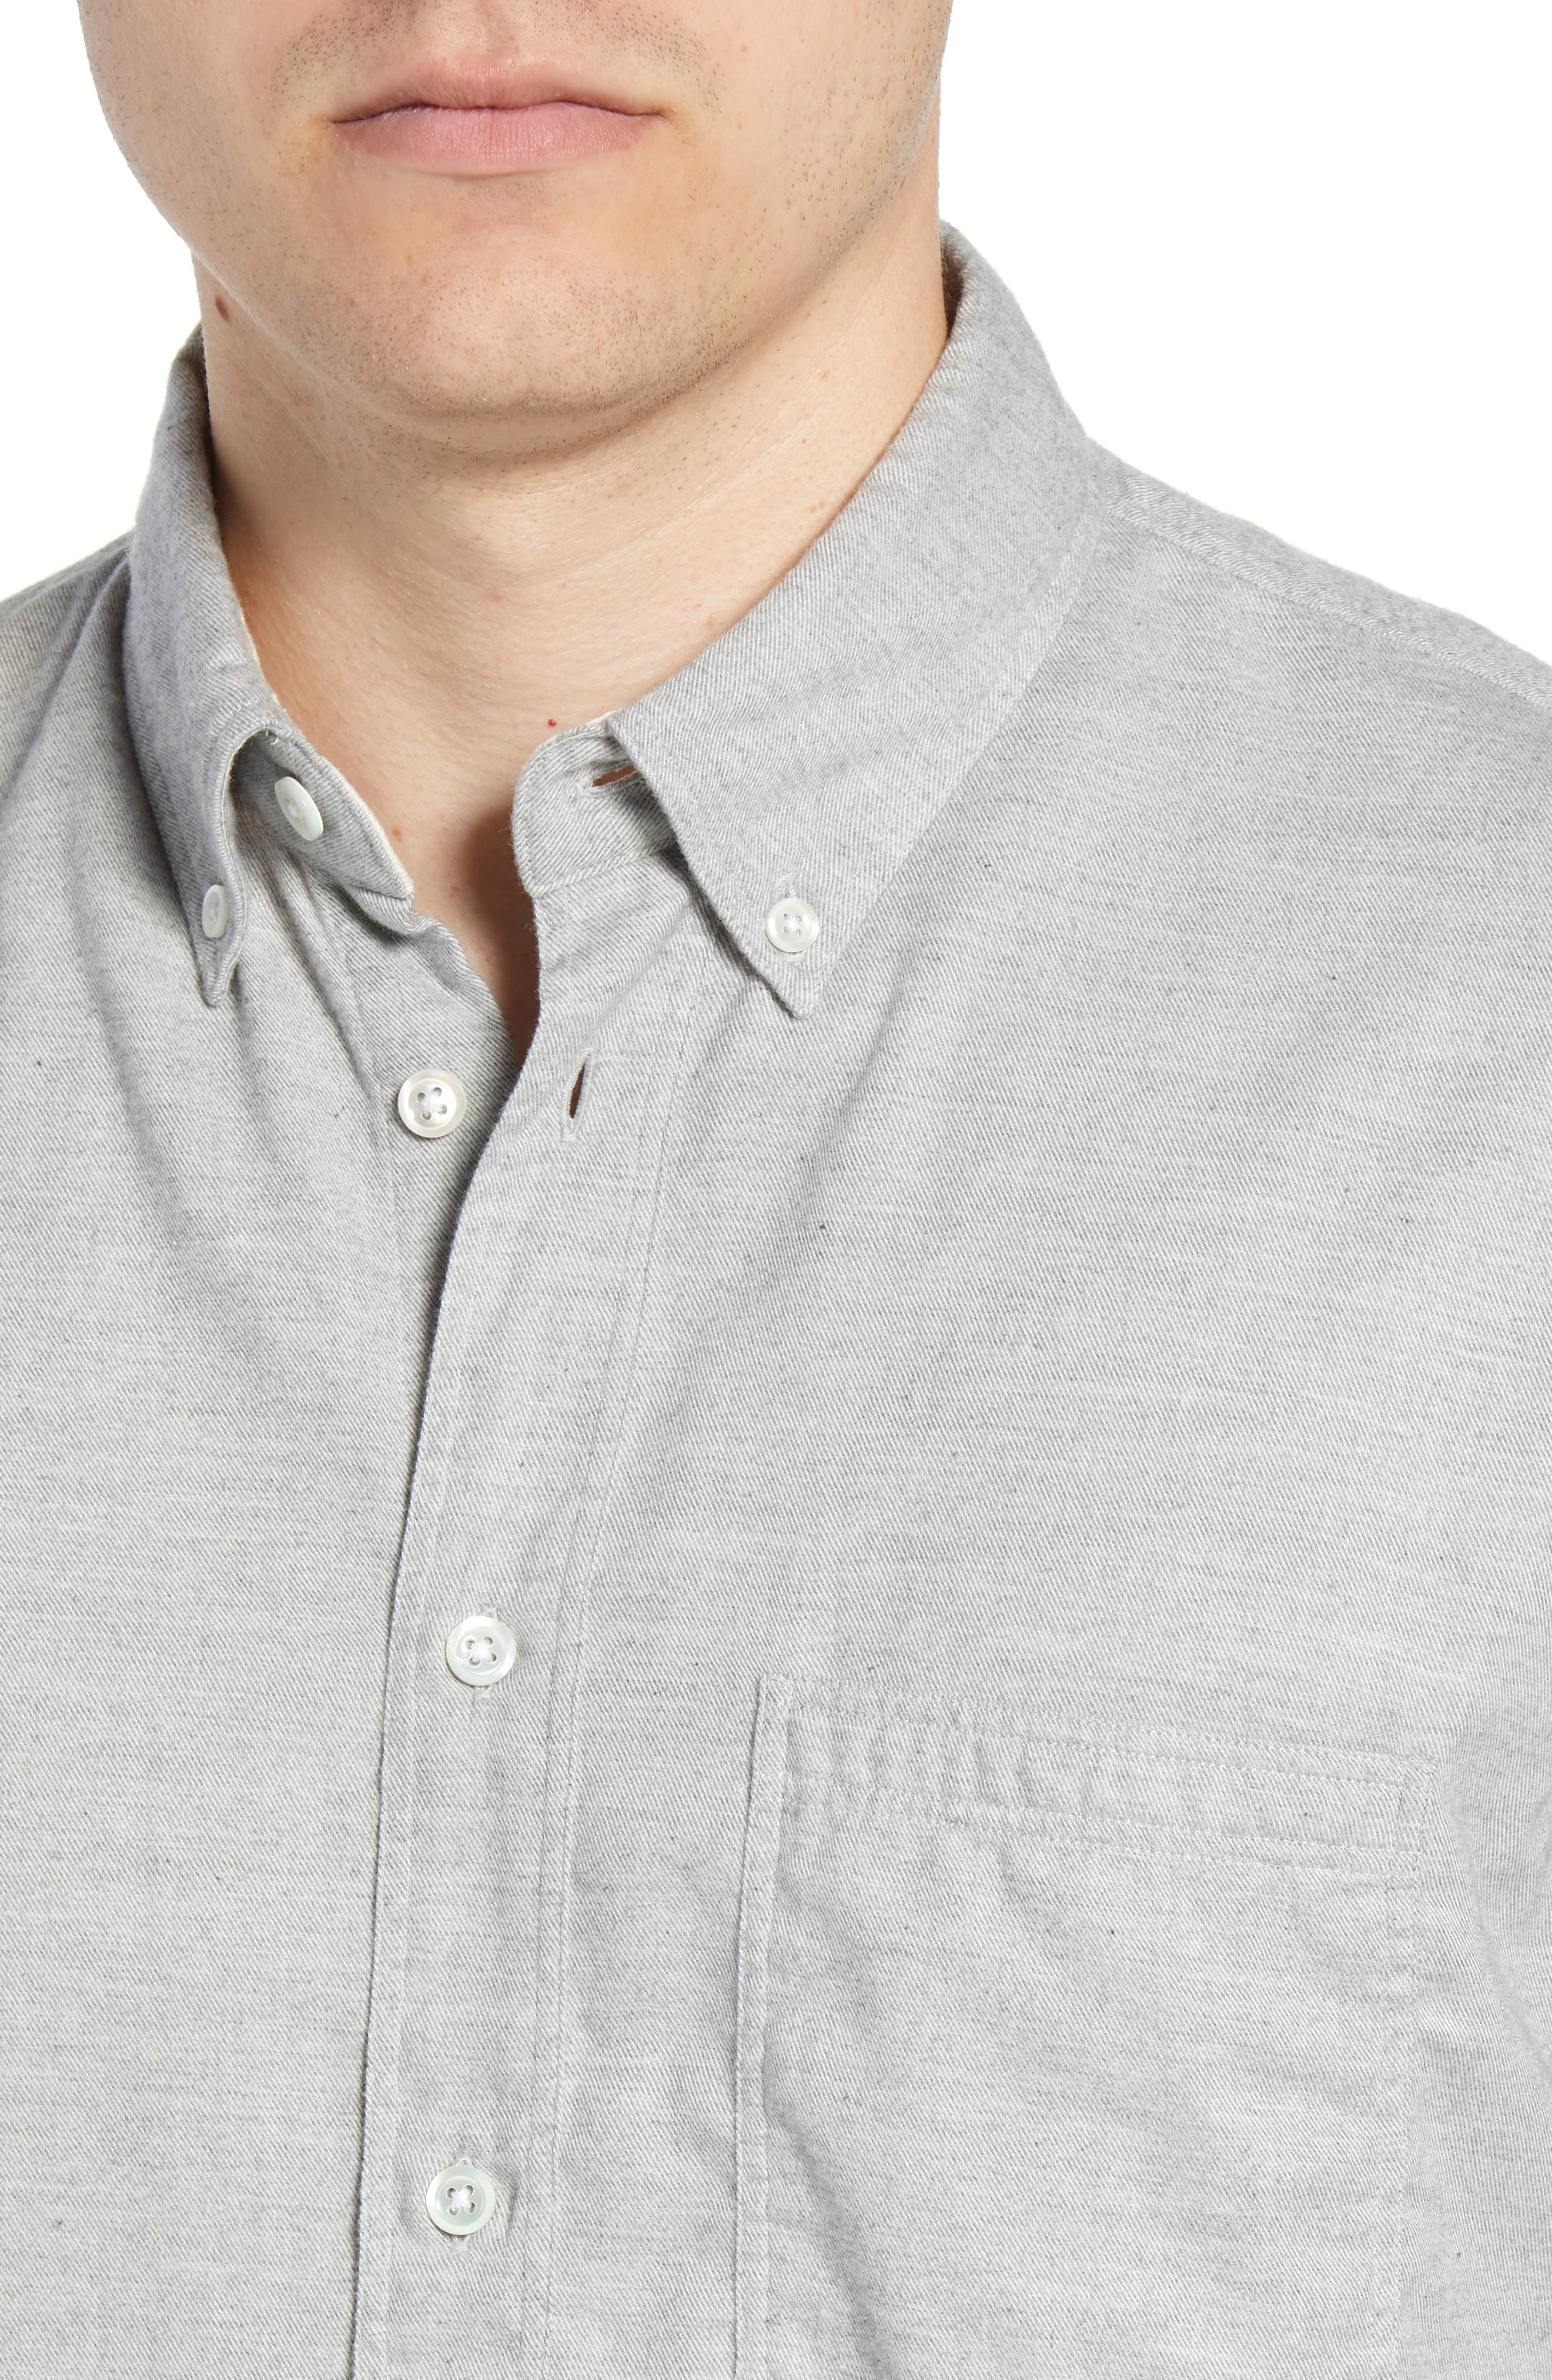 Tuscumbia Regular Fit Sport Shirt,                             Alternate thumbnail 2, color,                             LIGHT GREY